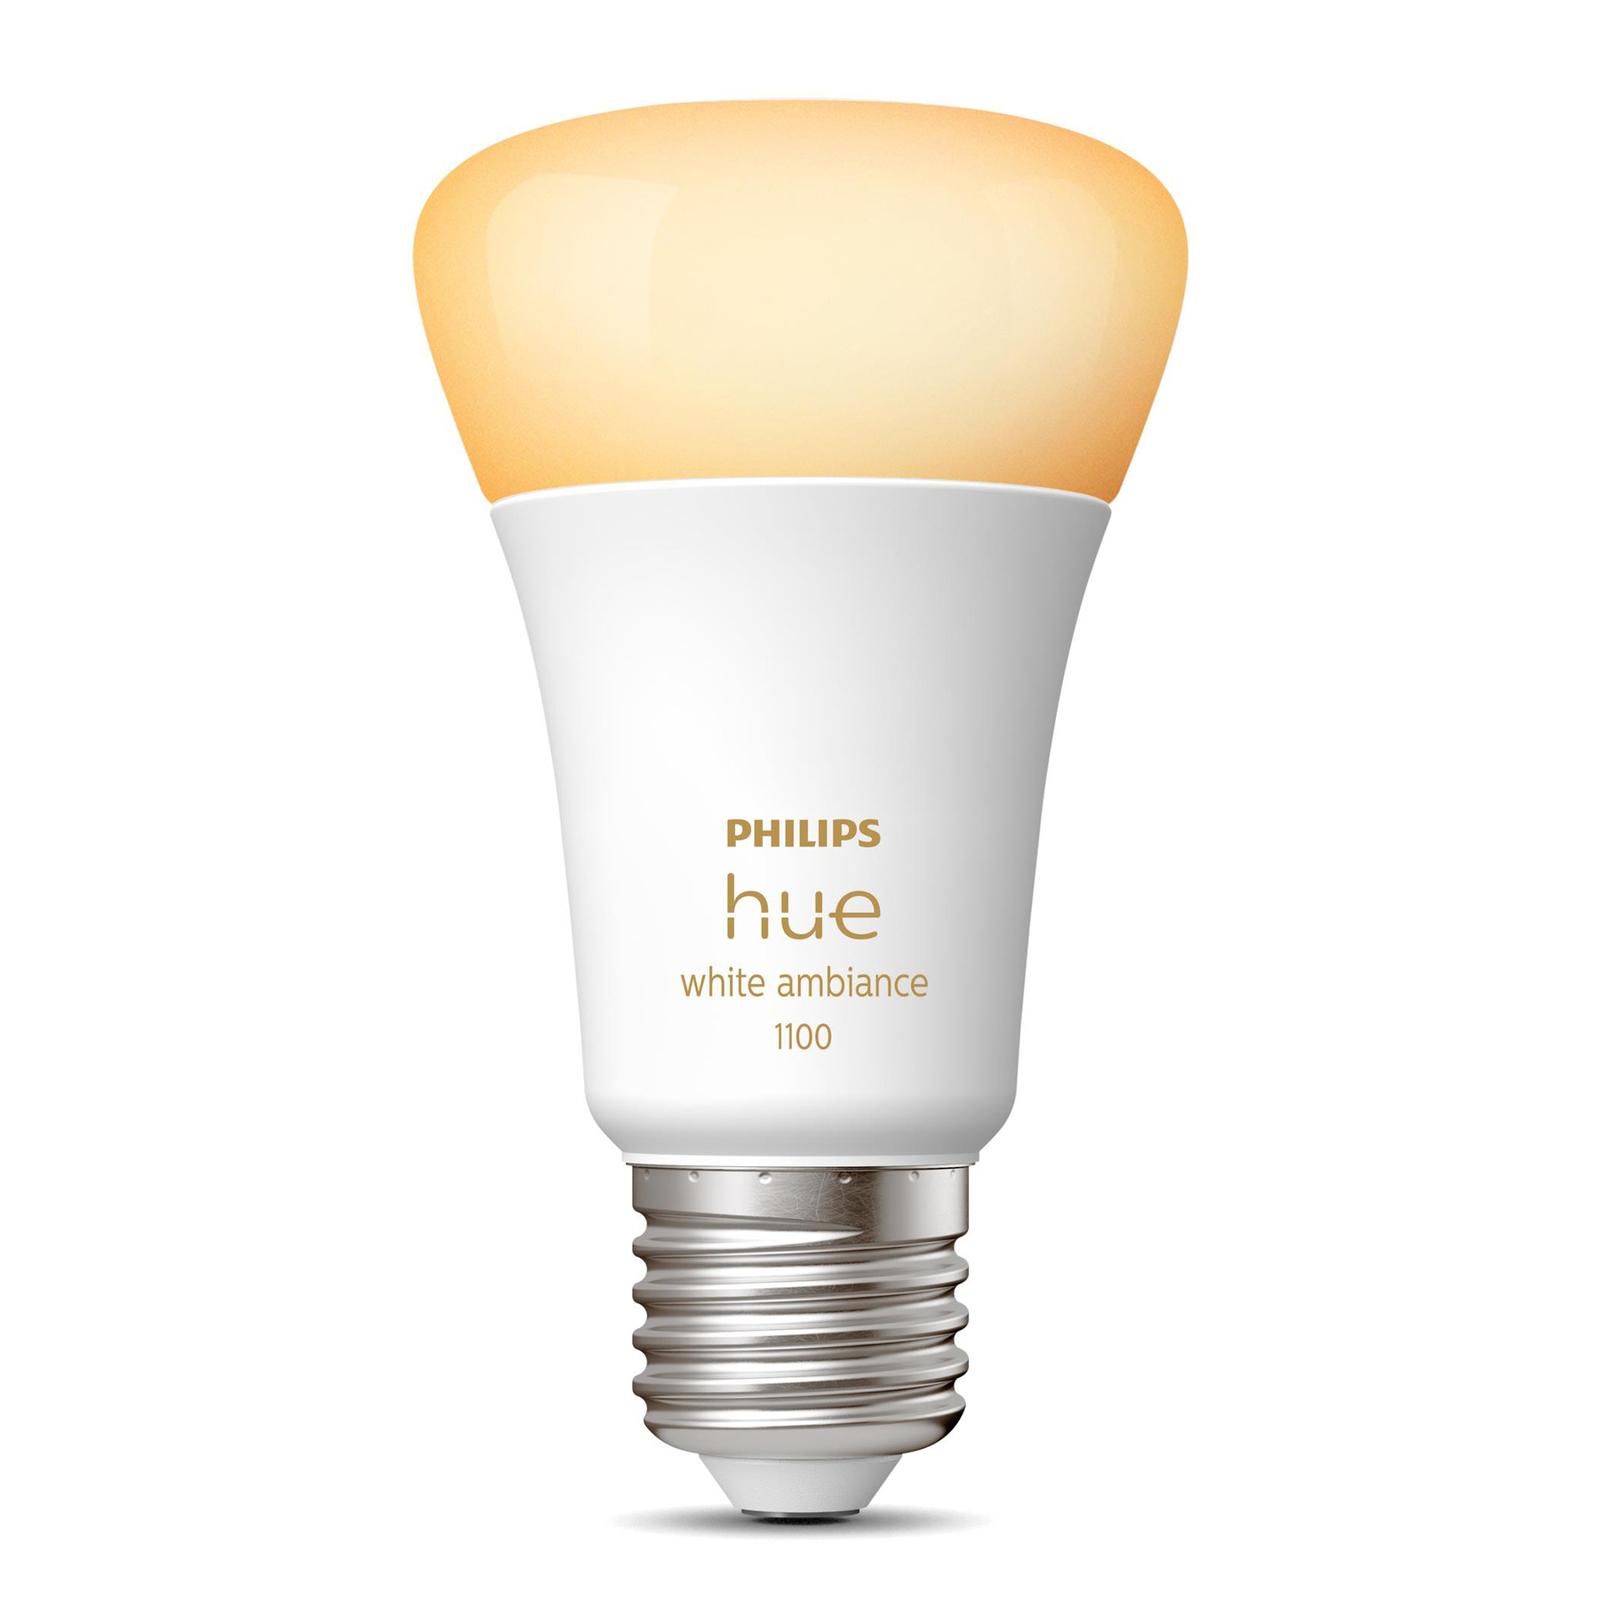 Philips Hue White Ambiance E27 LED-Lampe 8W 1100lm